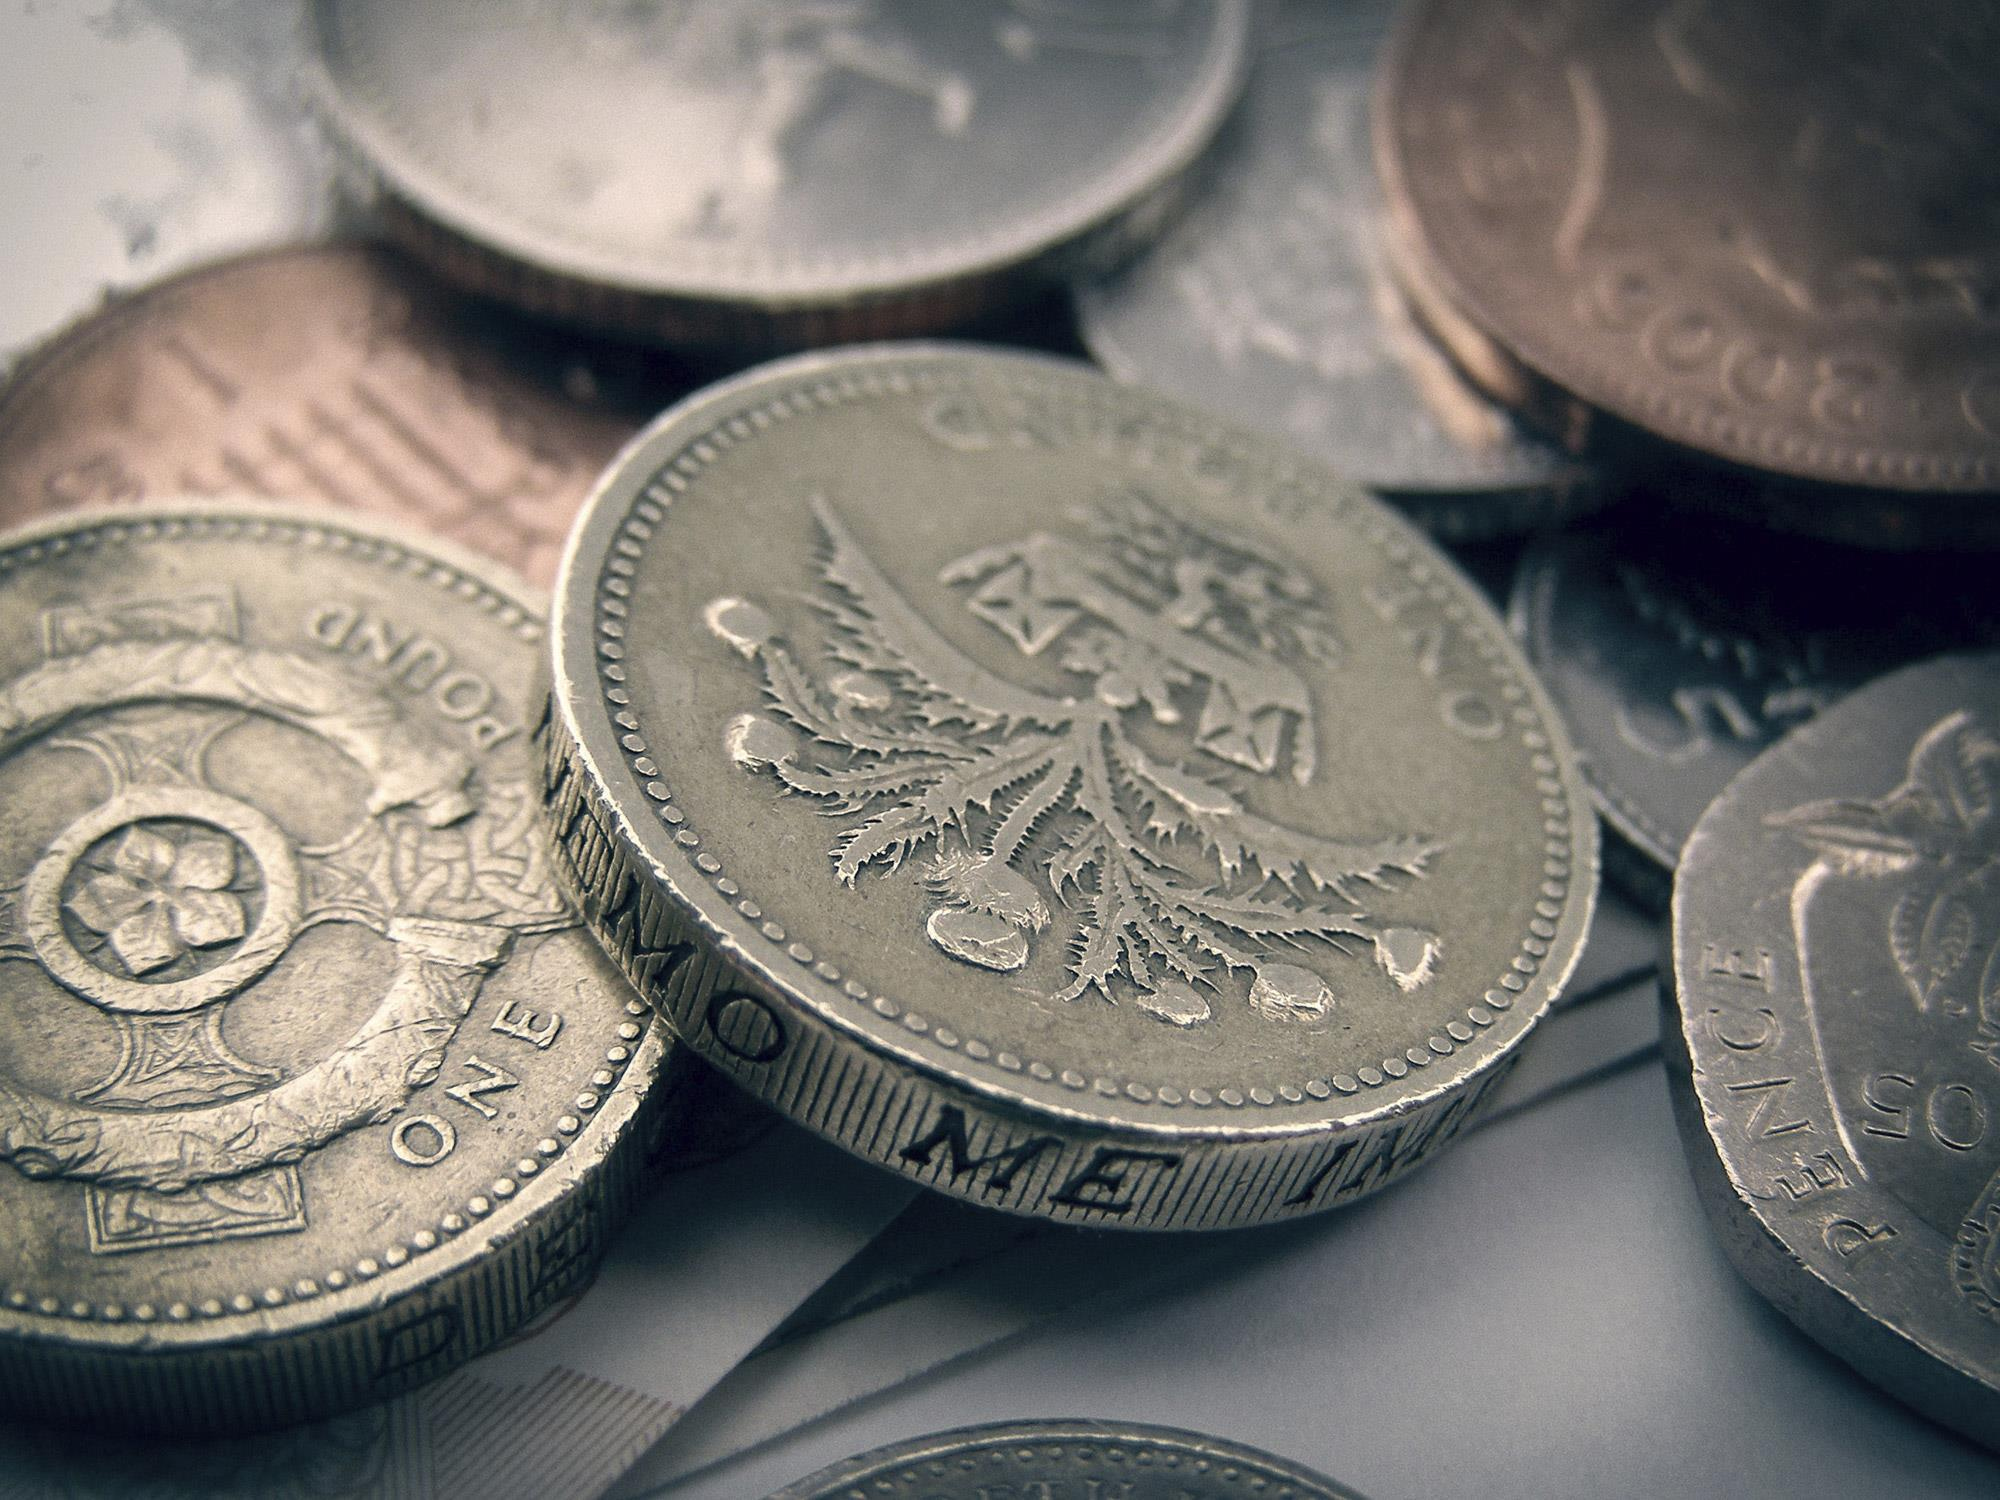 Quindell Faces Criminal Investigation Over Profit Errors